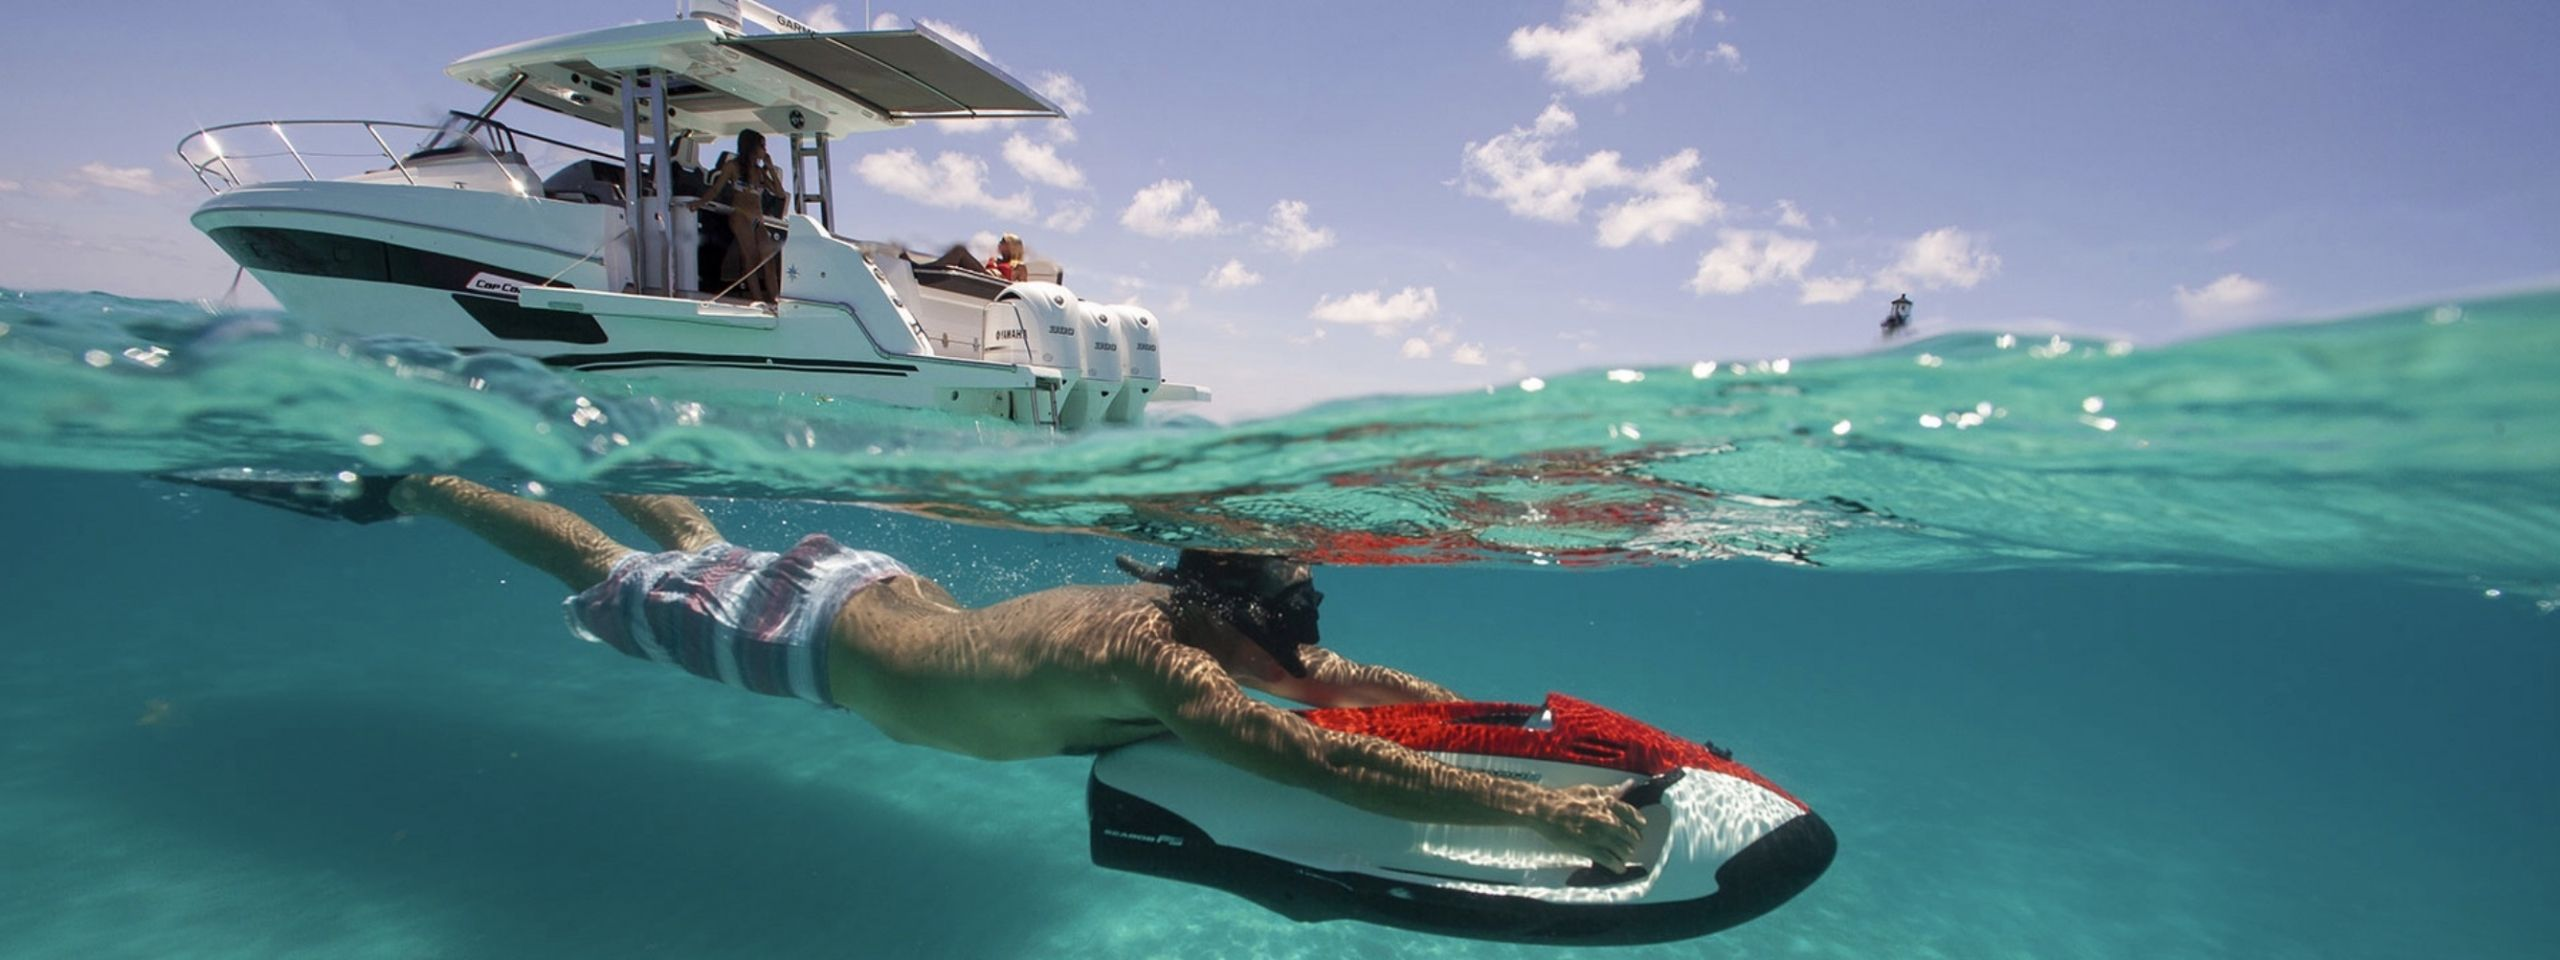 Yacht Toys & Water Sports Equipments - Jeanneau Seabob